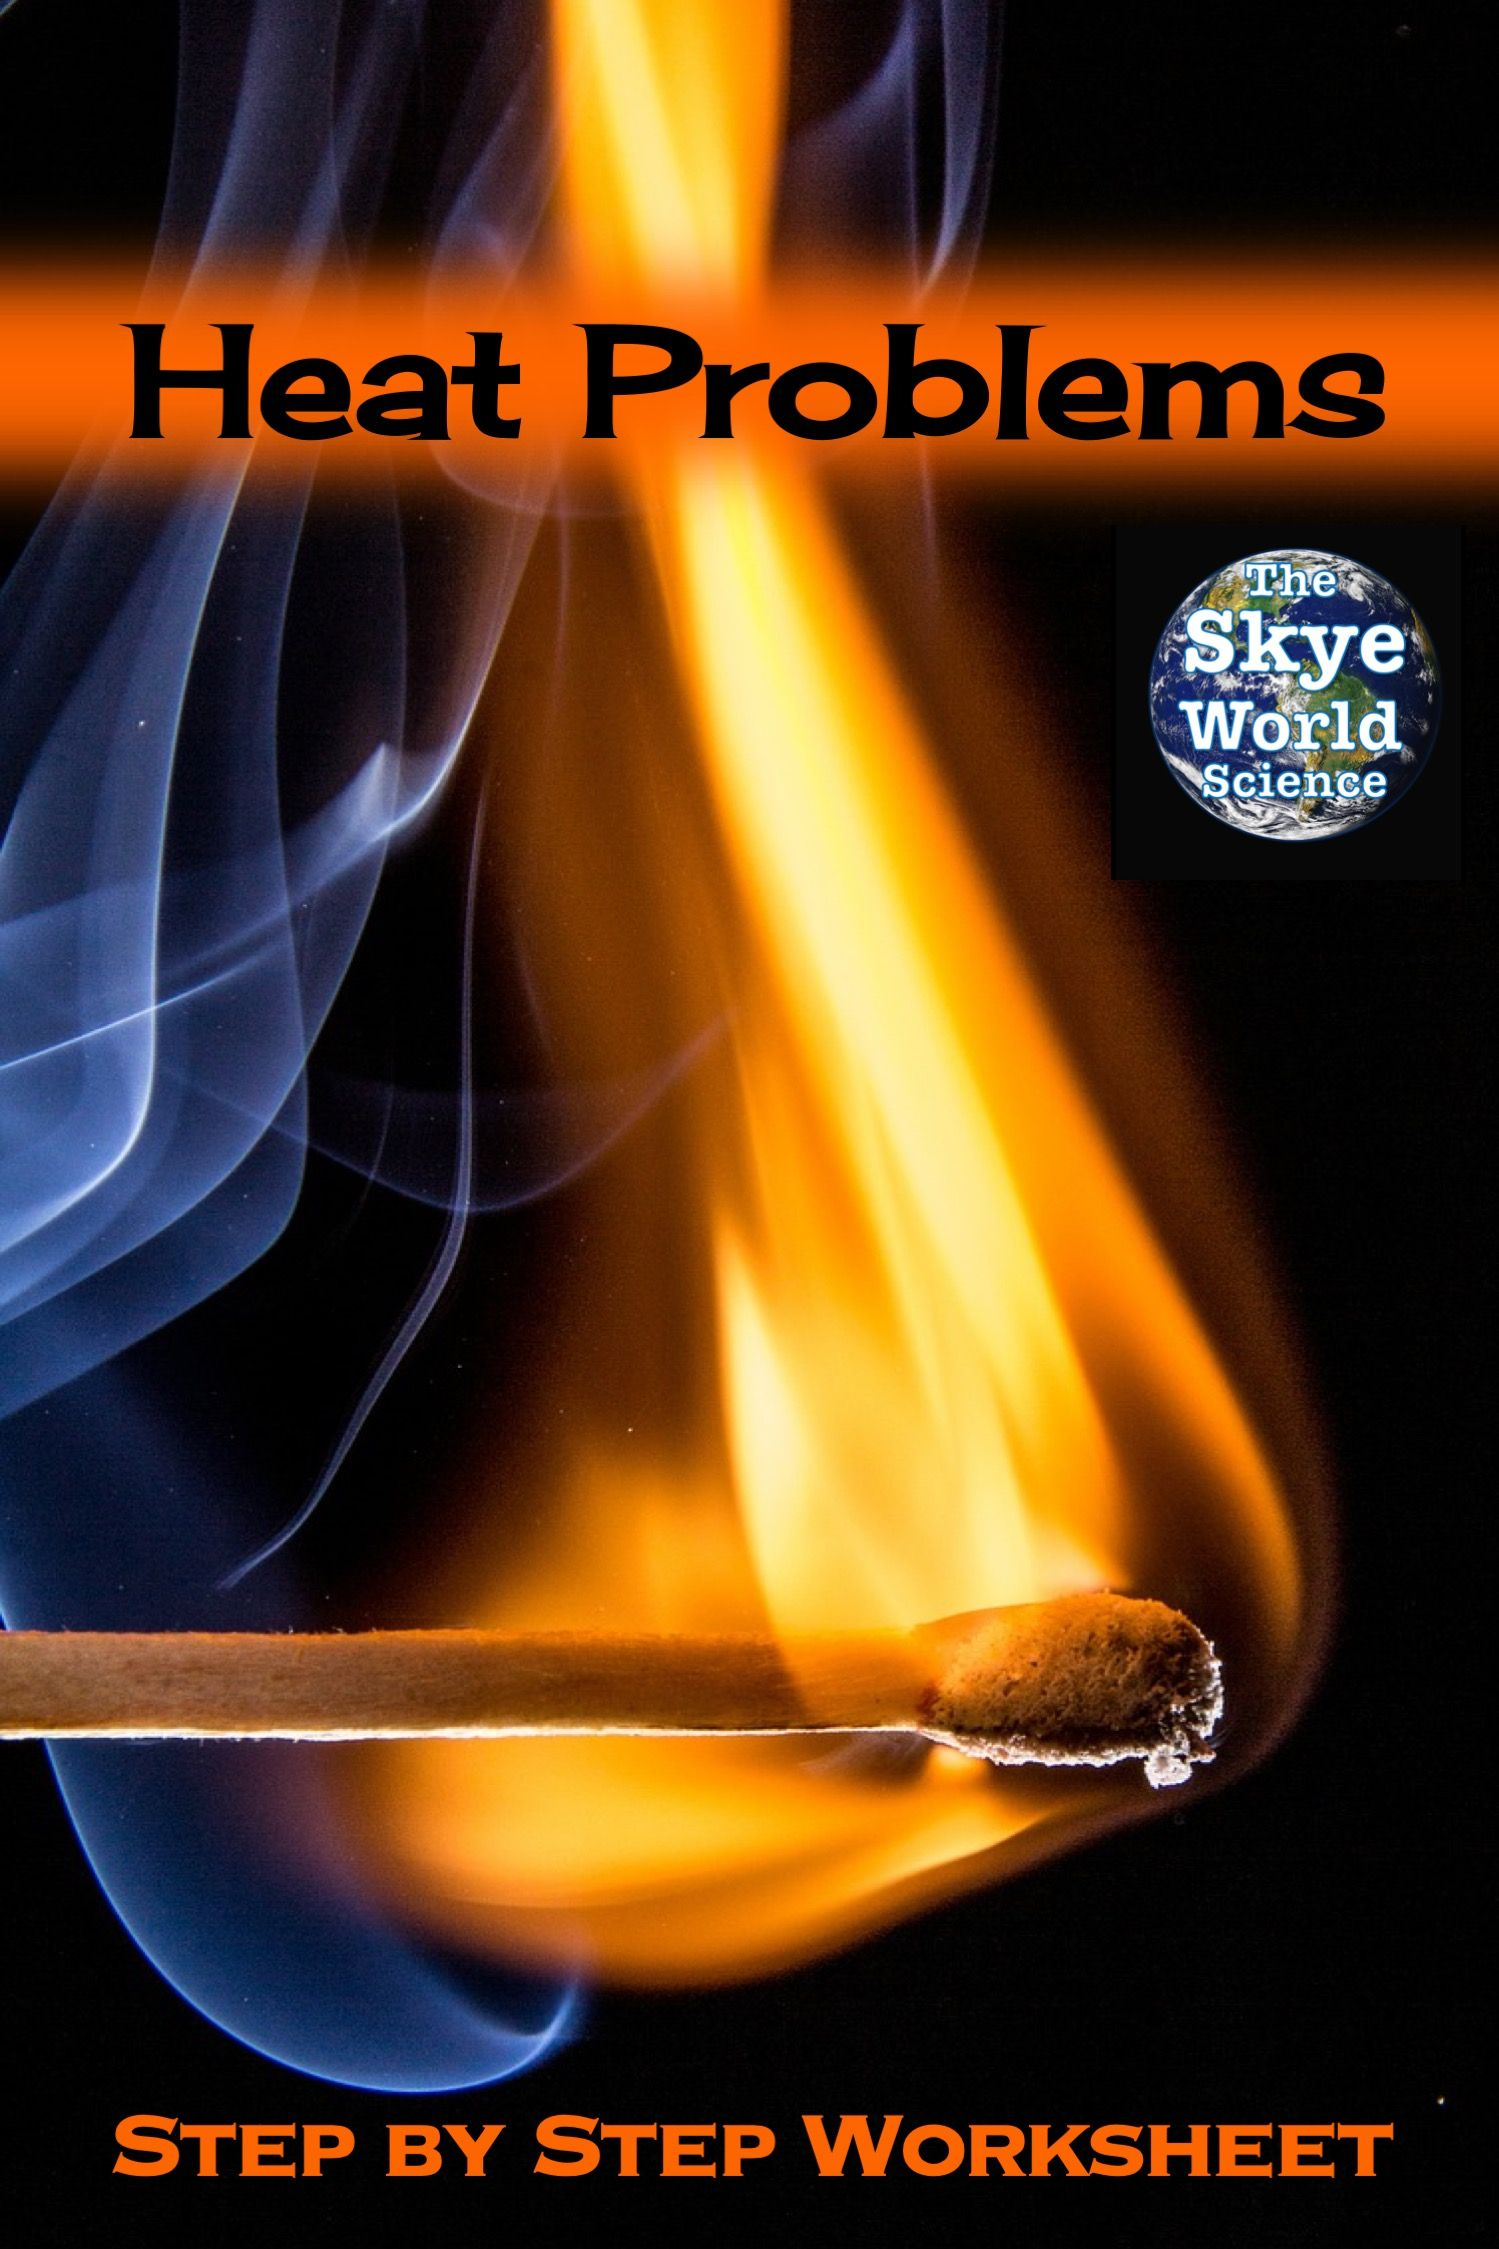 Heat Problems Worksheet